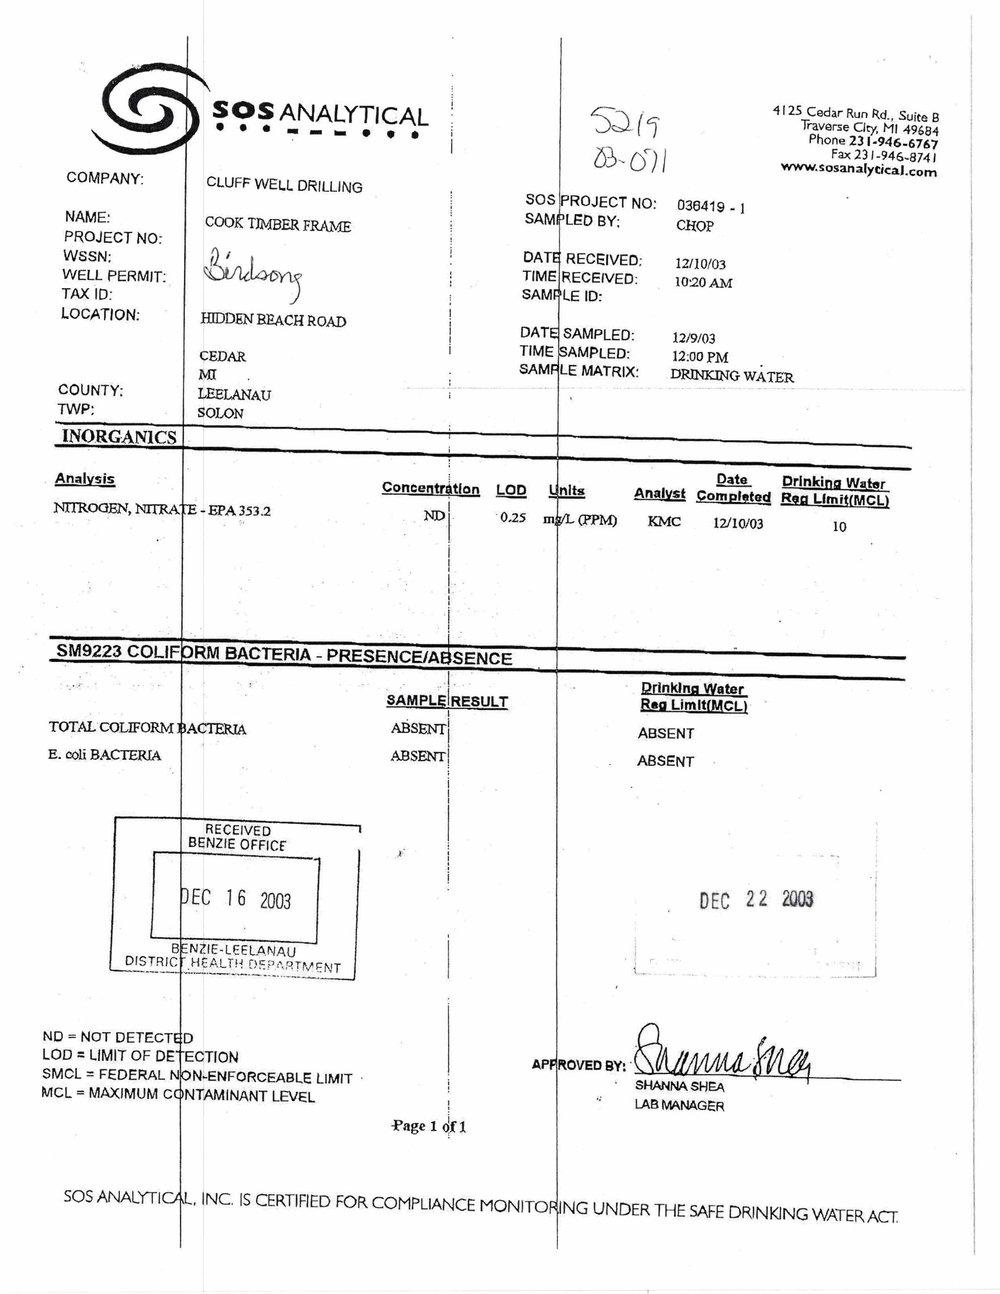 5500 E Hidden Beech, Cedar, MI - For sale by Oltersdorf Realty LLC - Marketing Packet (20).jpg